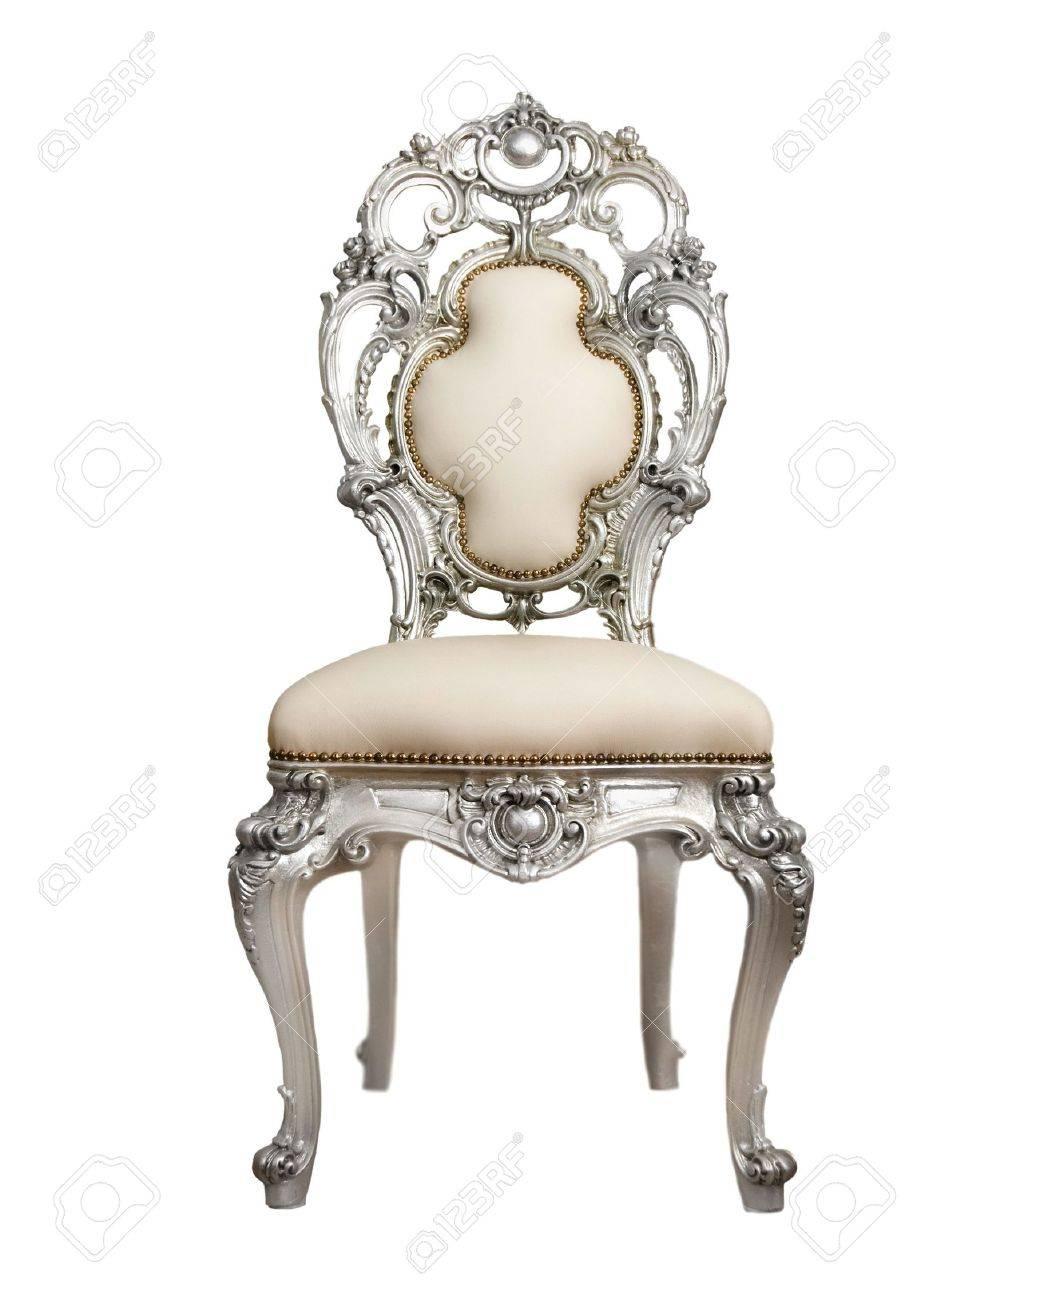 Luxurious chair Stock Photo - 6463081